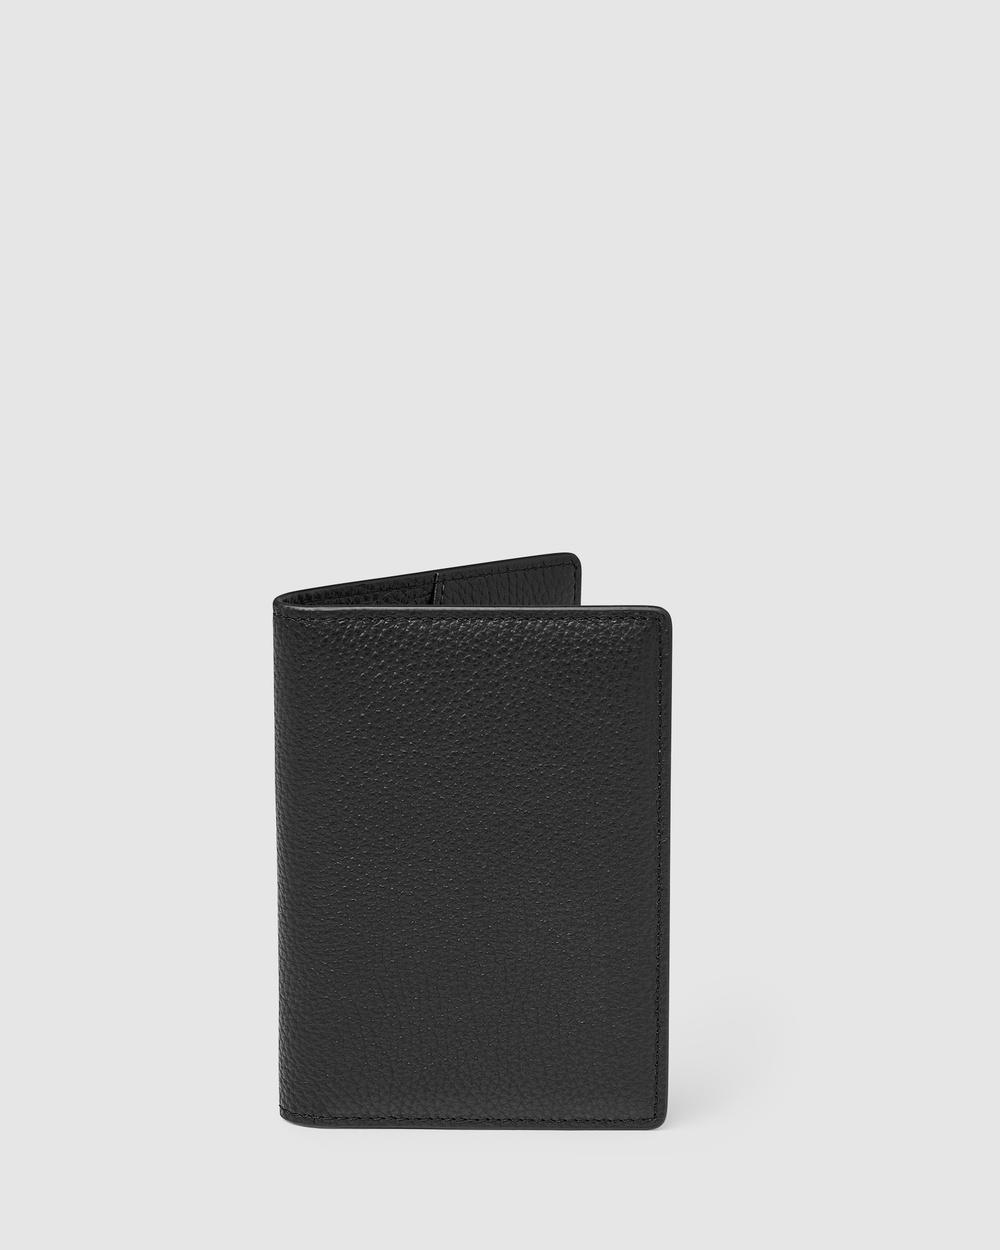 Kinnon Earle Passport Holder Travel and Luggage Black